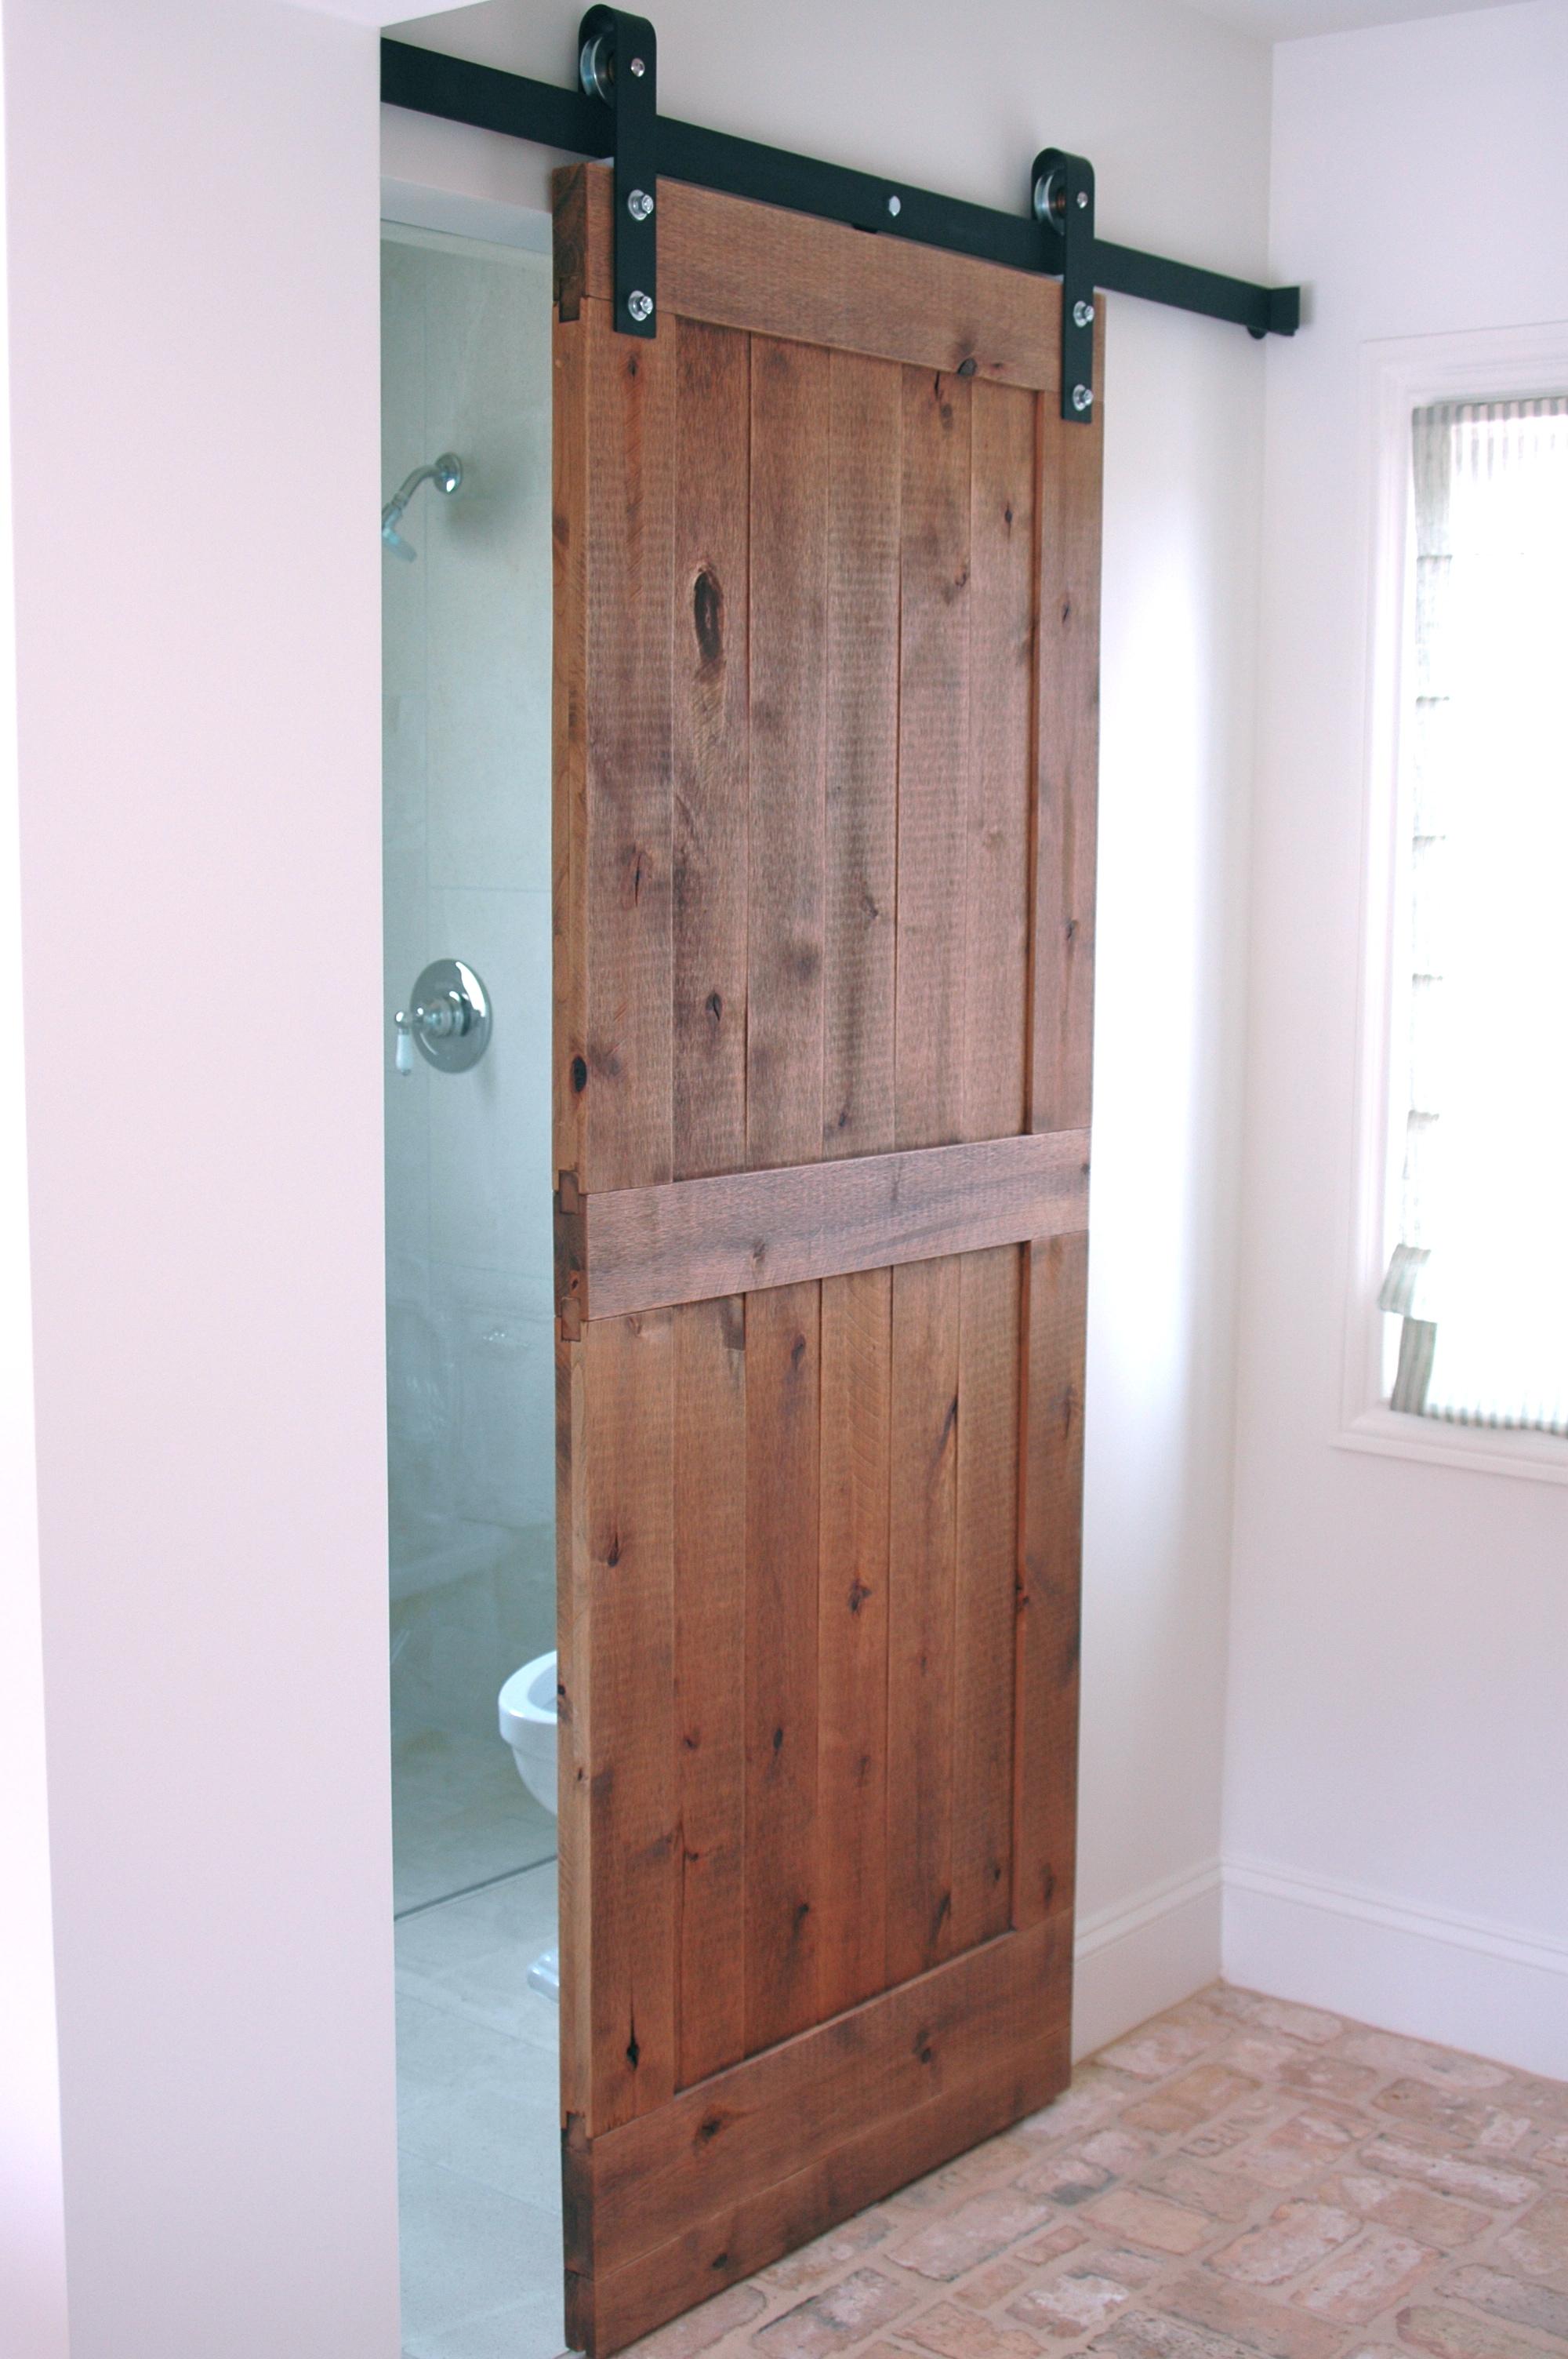 Barn door, barn door hardware, barn door in bath, barn door in house, custom barn door,